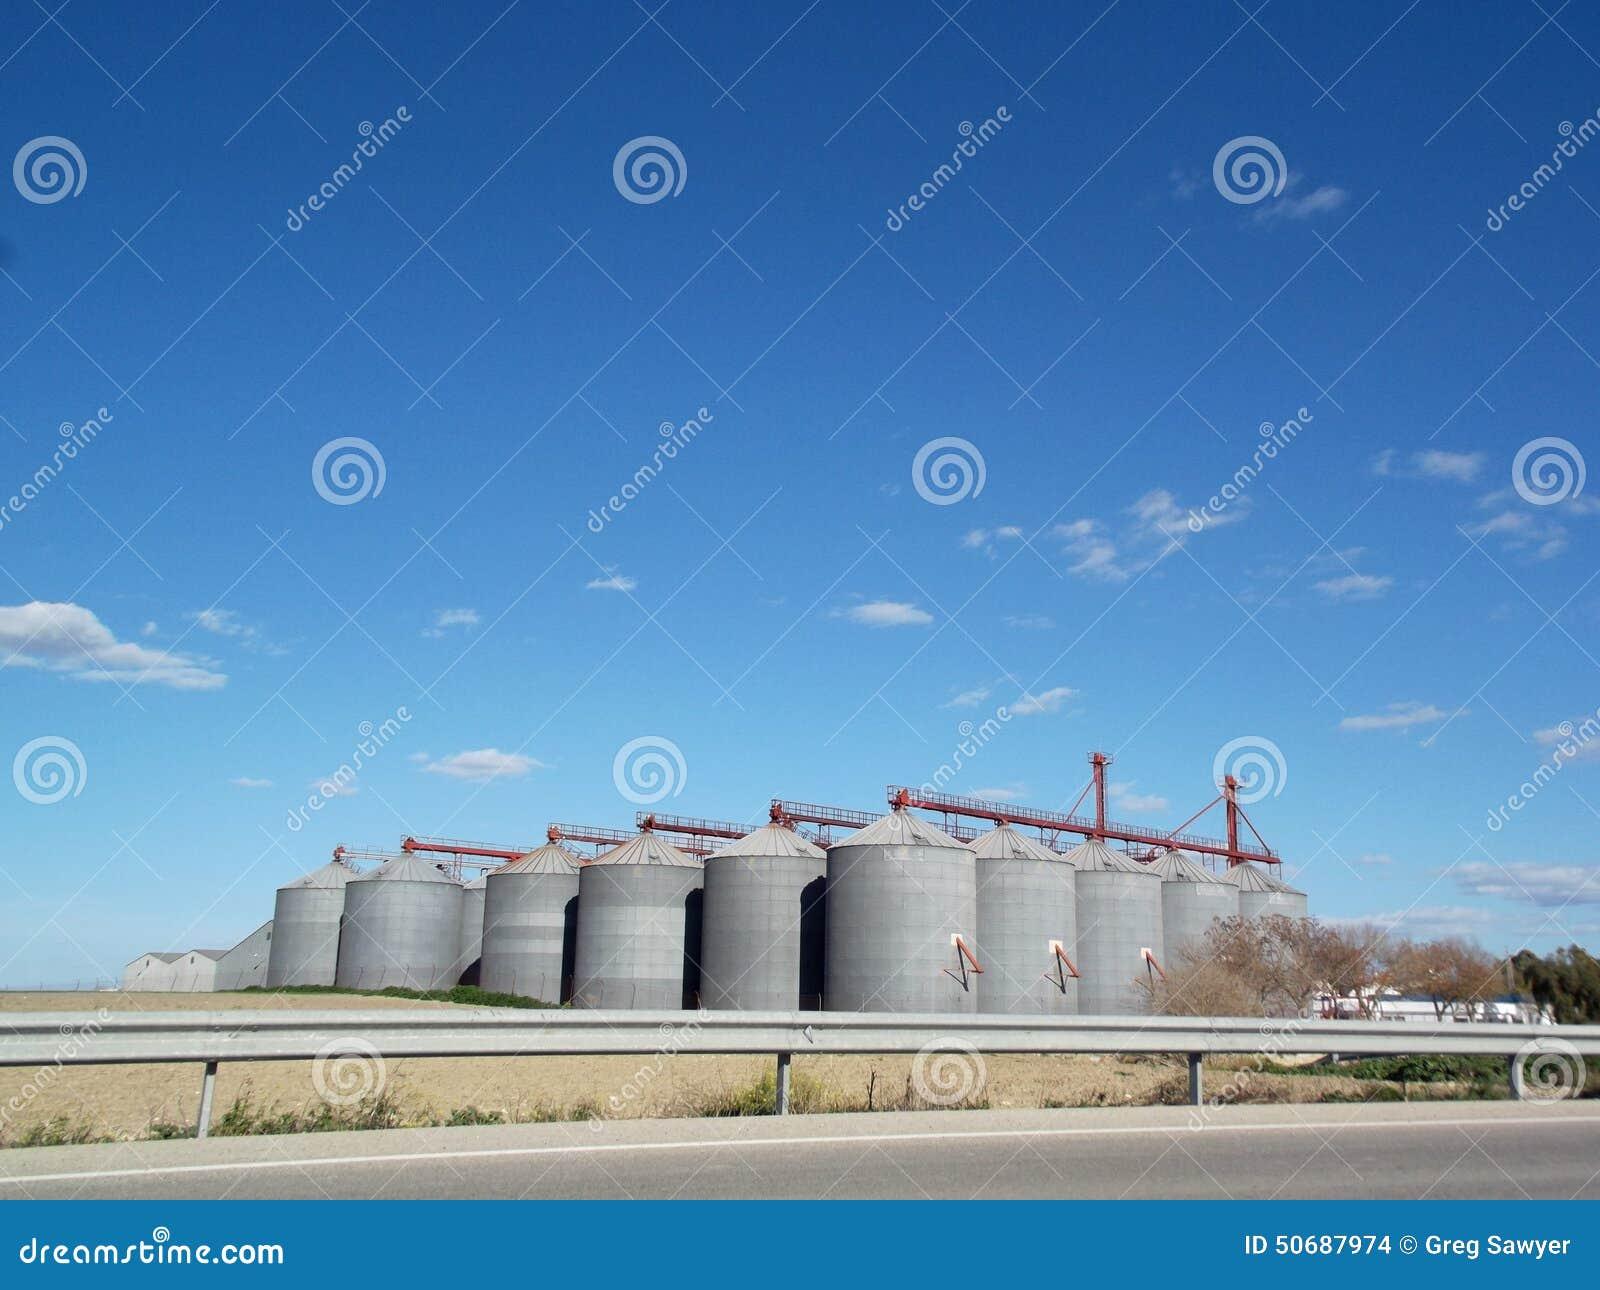 Download 槽坊在赫雷斯,安达卢西亚,西班牙 库存照片. 图片 包括有 天空, 云彩, 农村, 生产, 蓝色, 灰色 - 50687974